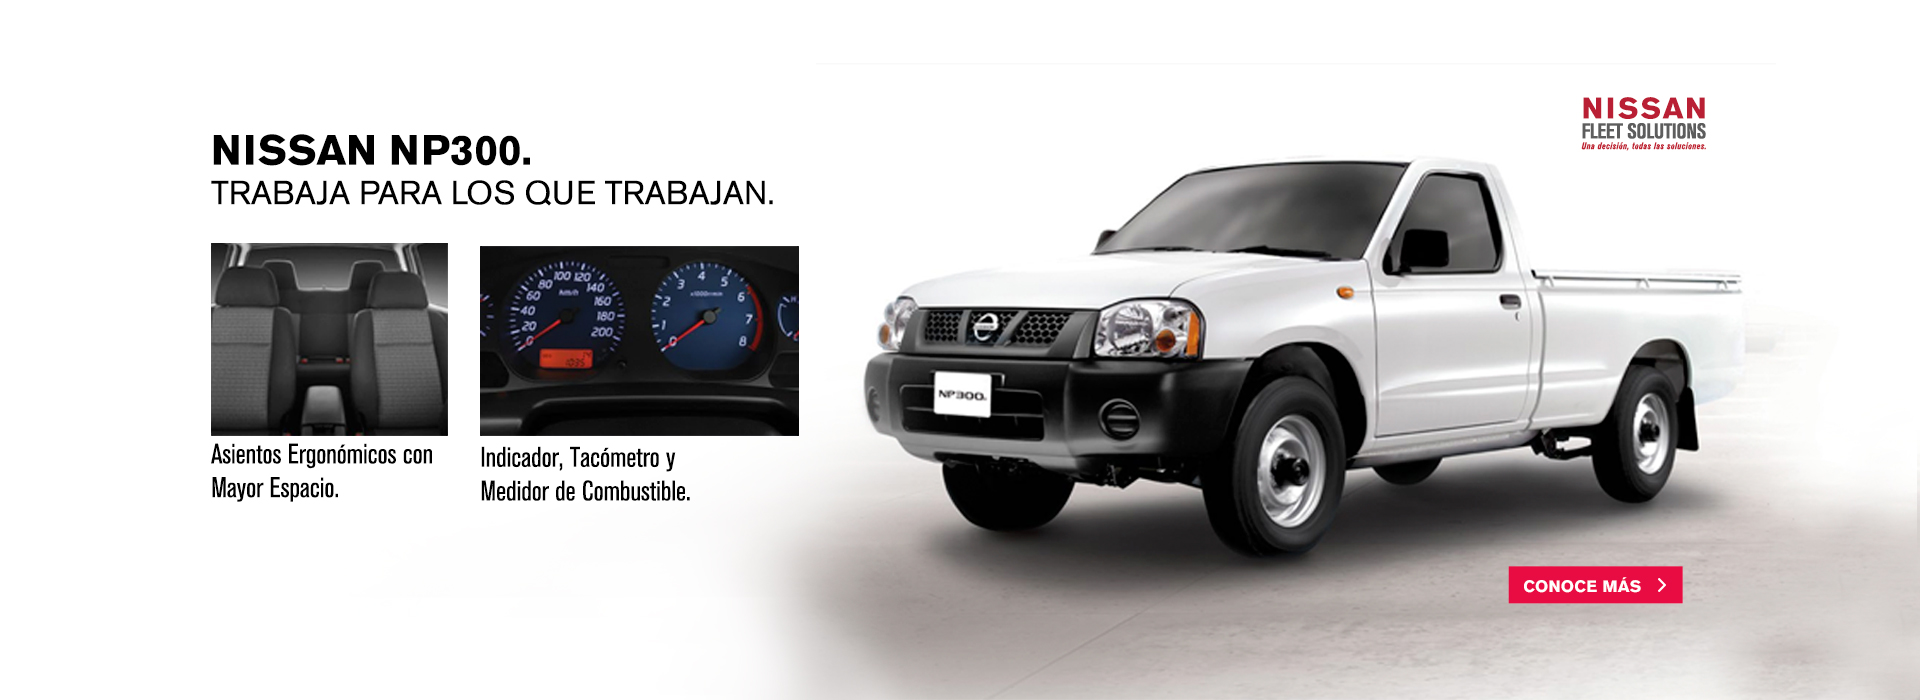 Nissan LCV's